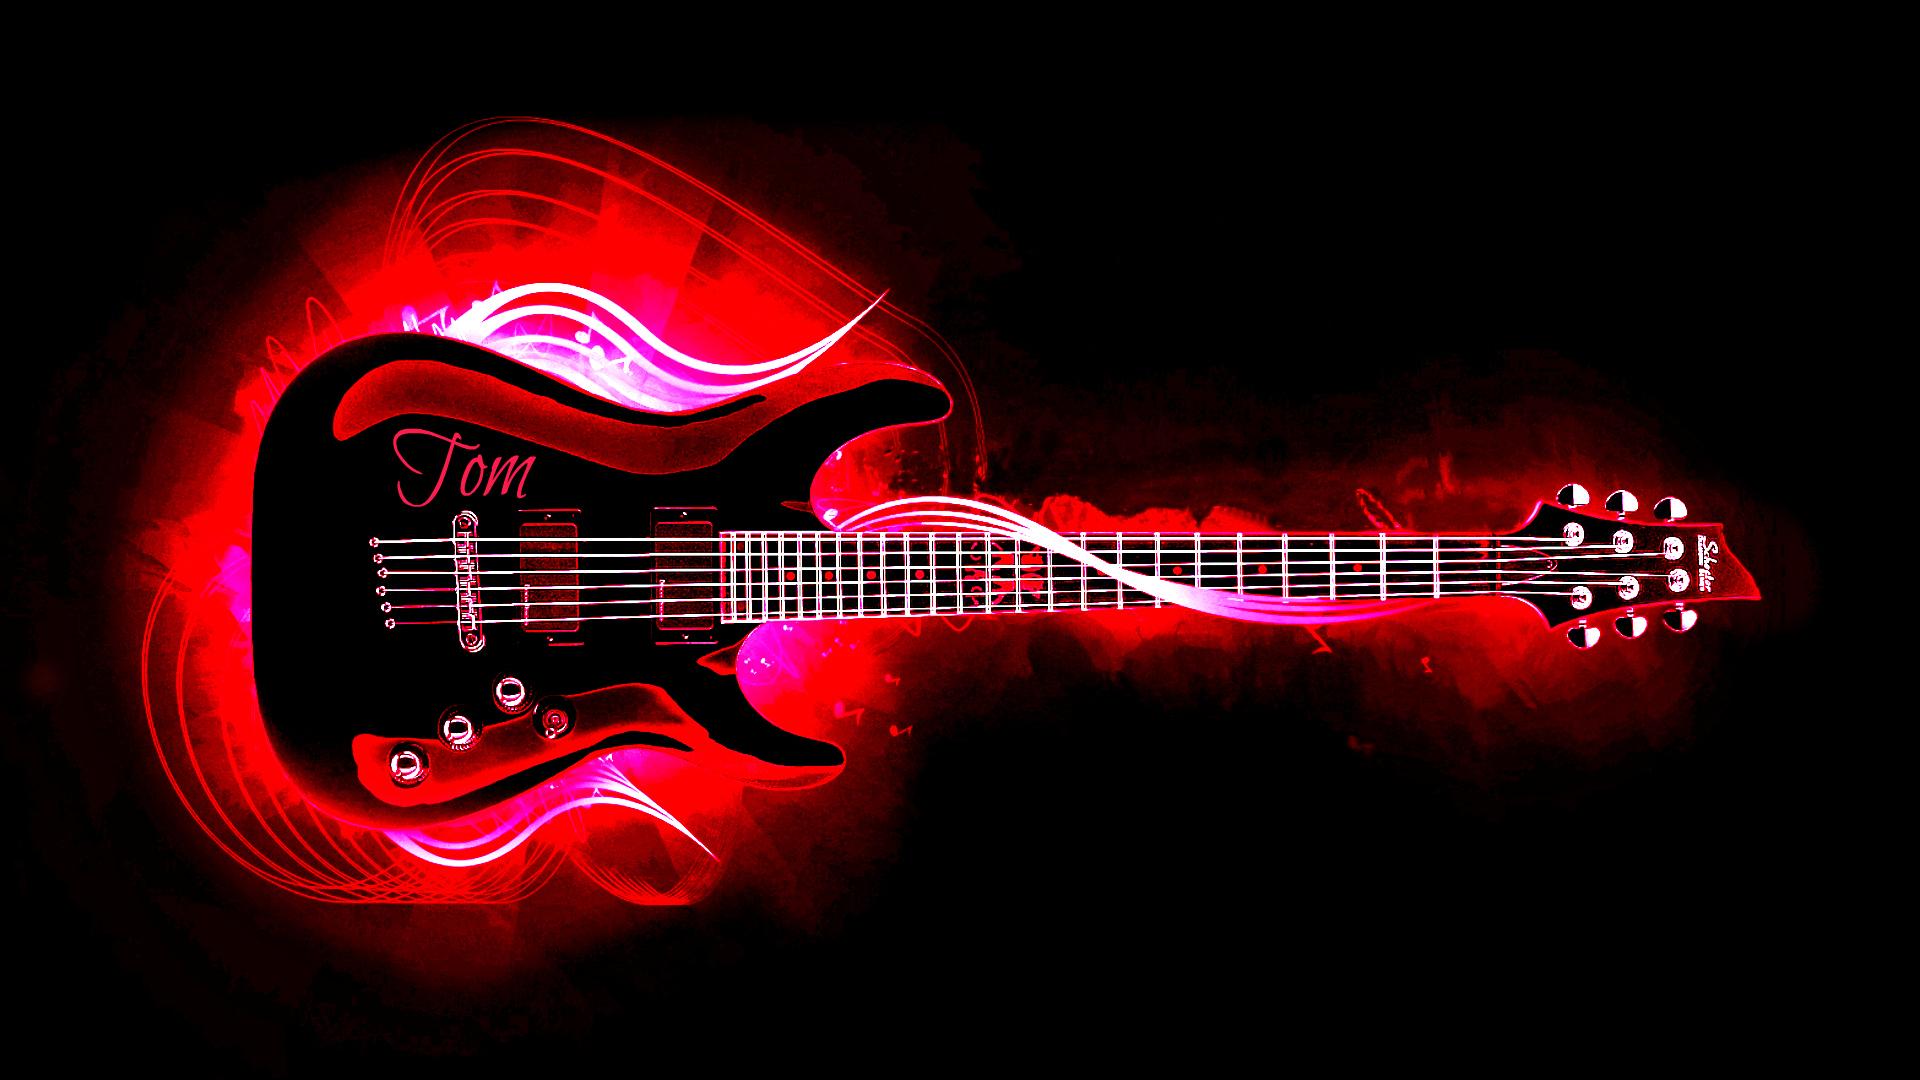 Free Download Guitar Wallpaper For Facebook Cover Wallpaper